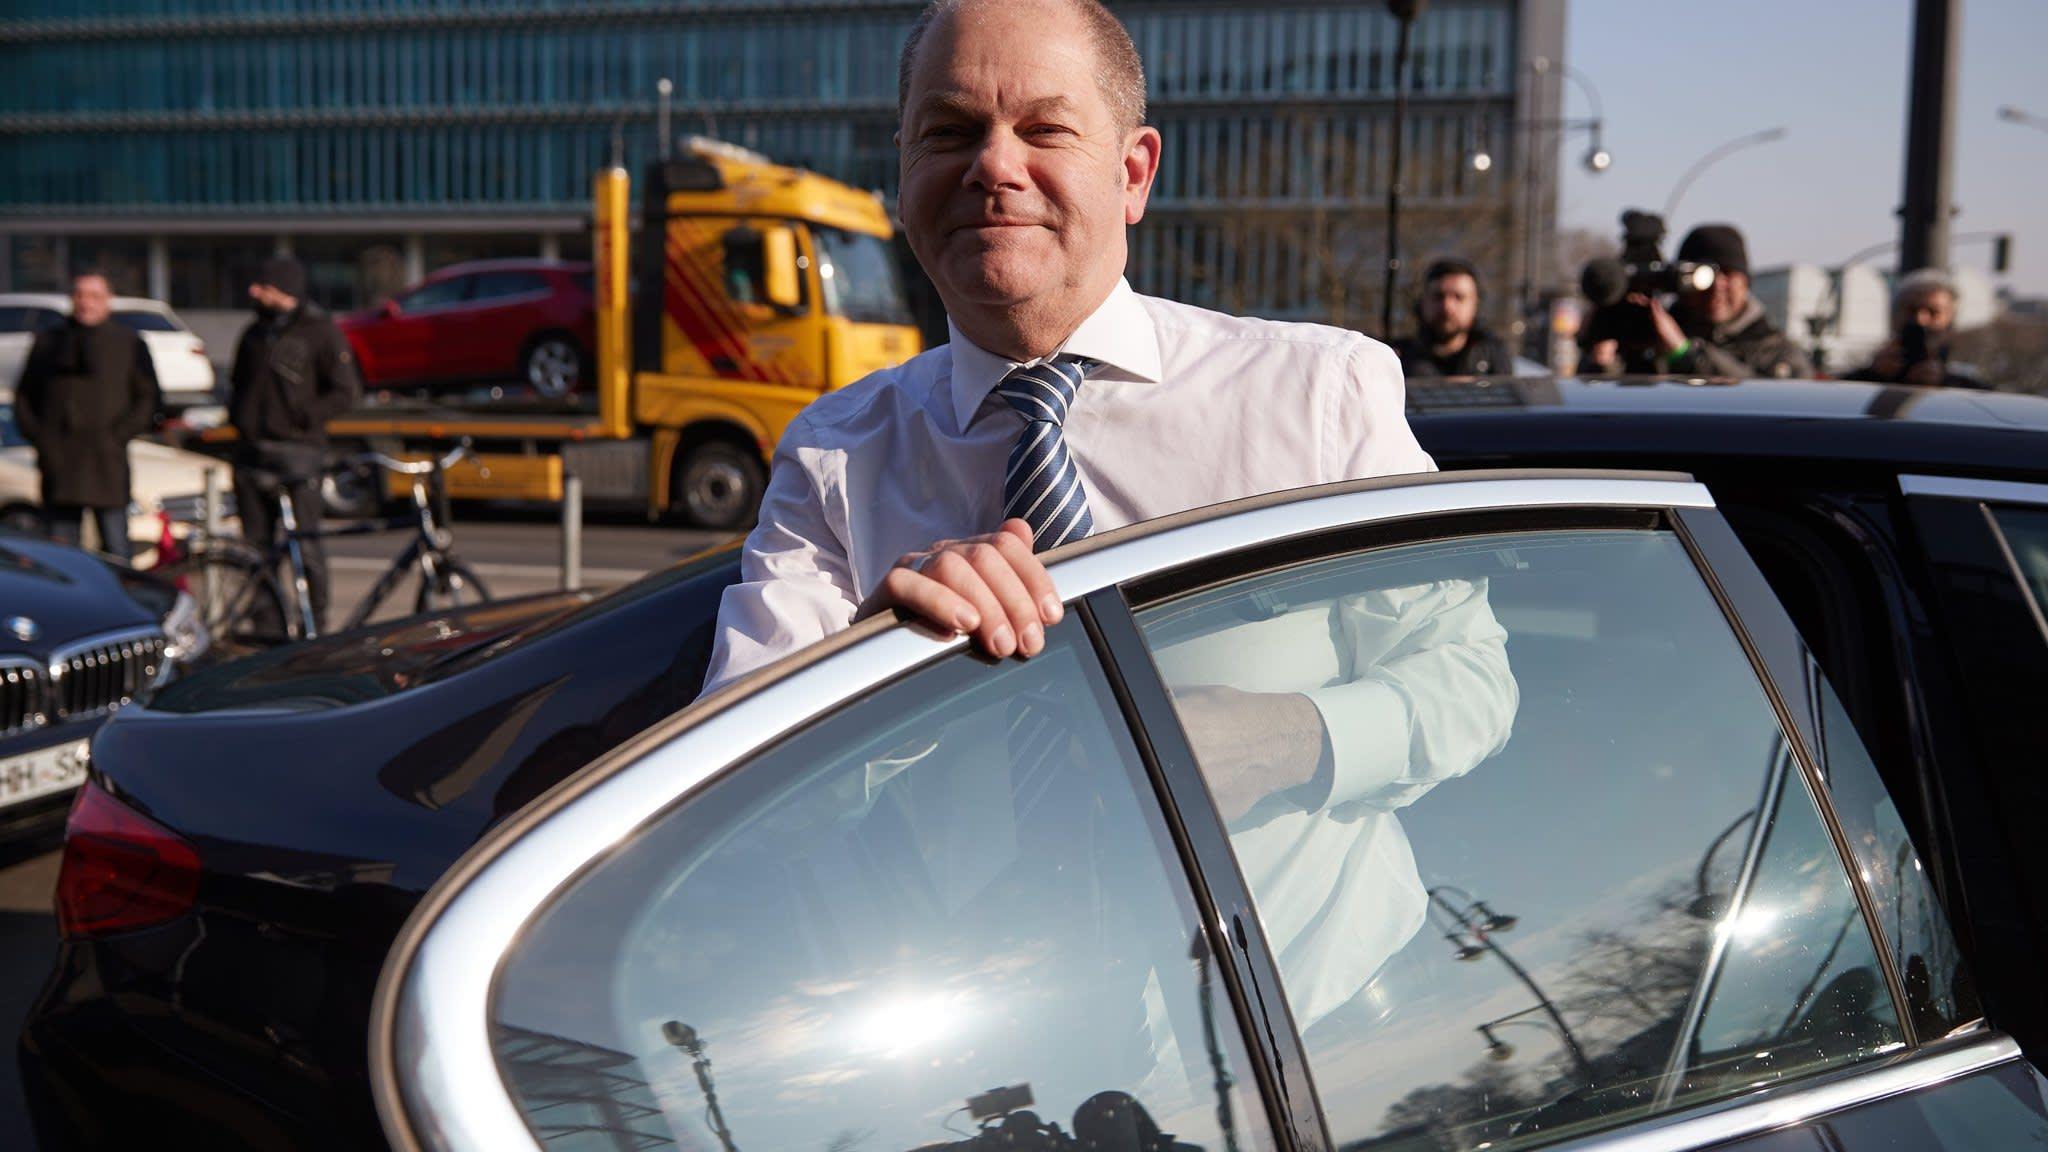 Olaf Scholz, Germany's robotic finance minister